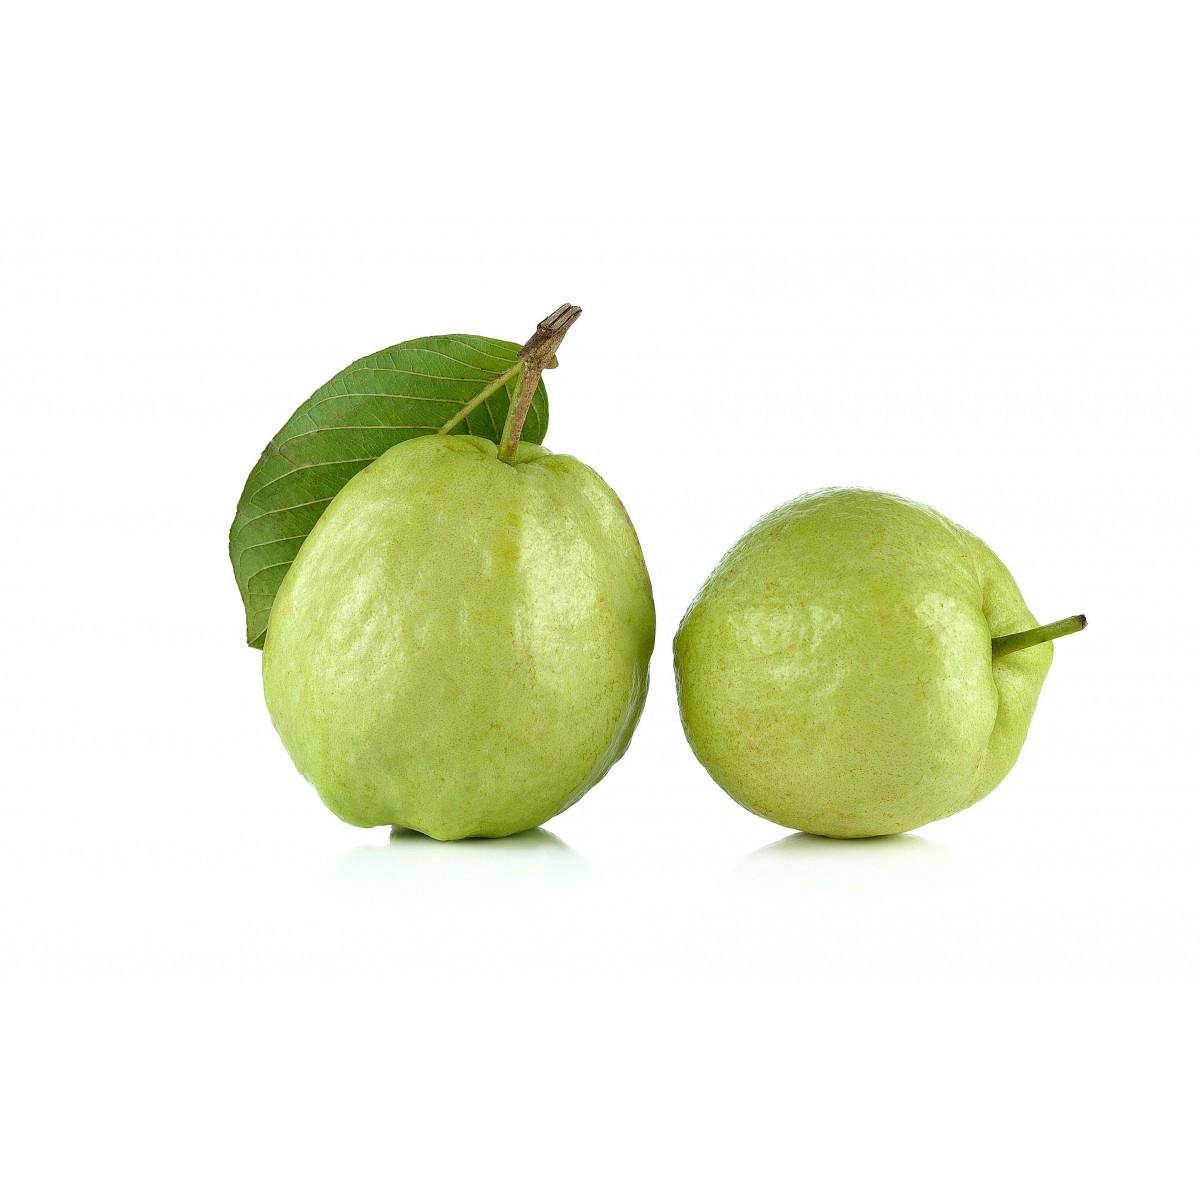 Thailand Fruit Wholesaler Email Mail: Thai Guava Seedless